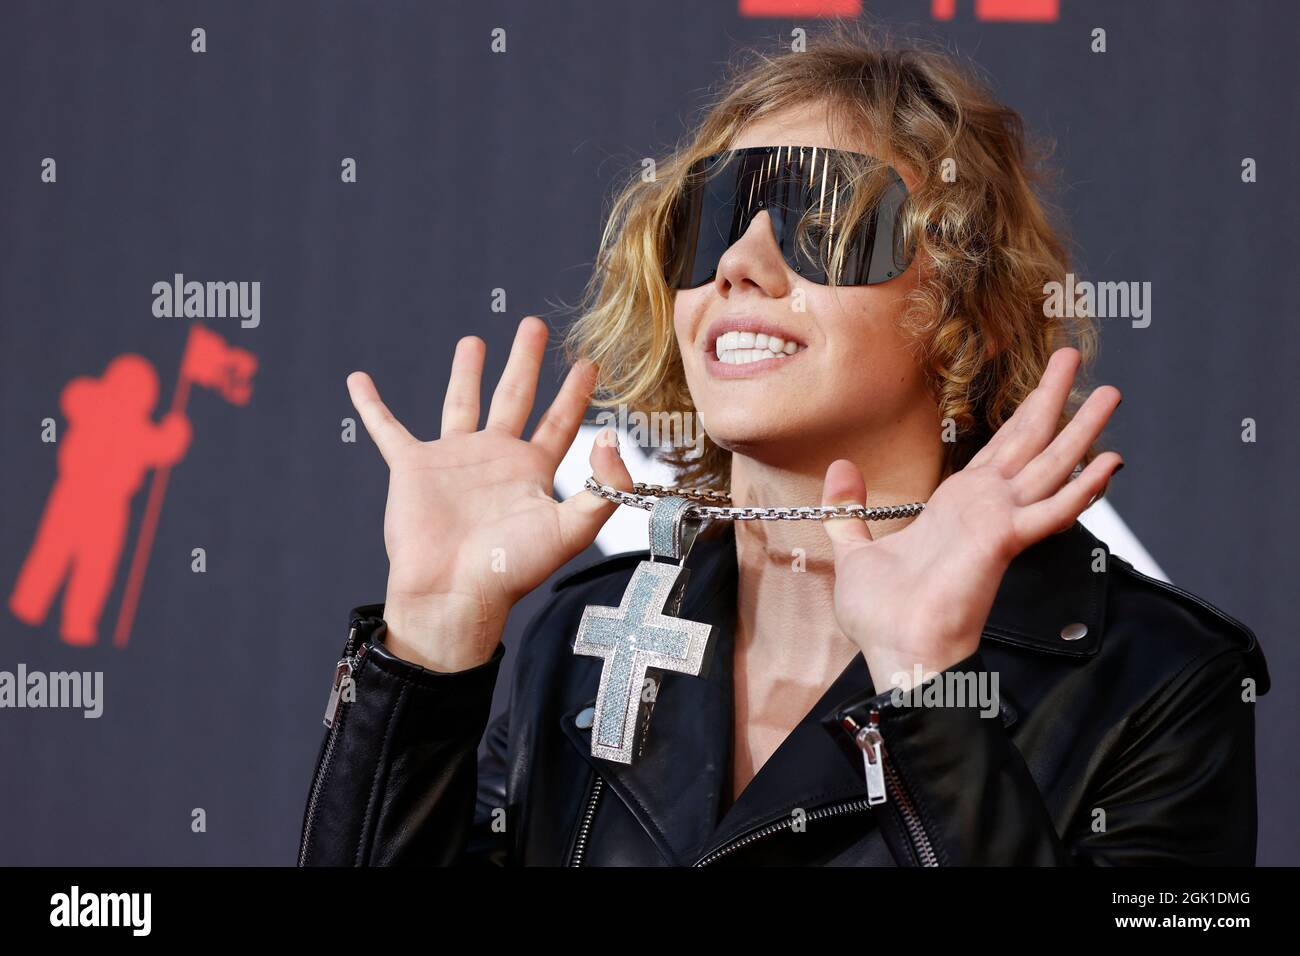 2021 MTV Video Music Awards - arrivées - Barclays Center, Brooklyn, New York, États-Unis, septembre 12, 2021 - le Kid Laroi. REUTERS/Andrew Kelly Banque D'Images